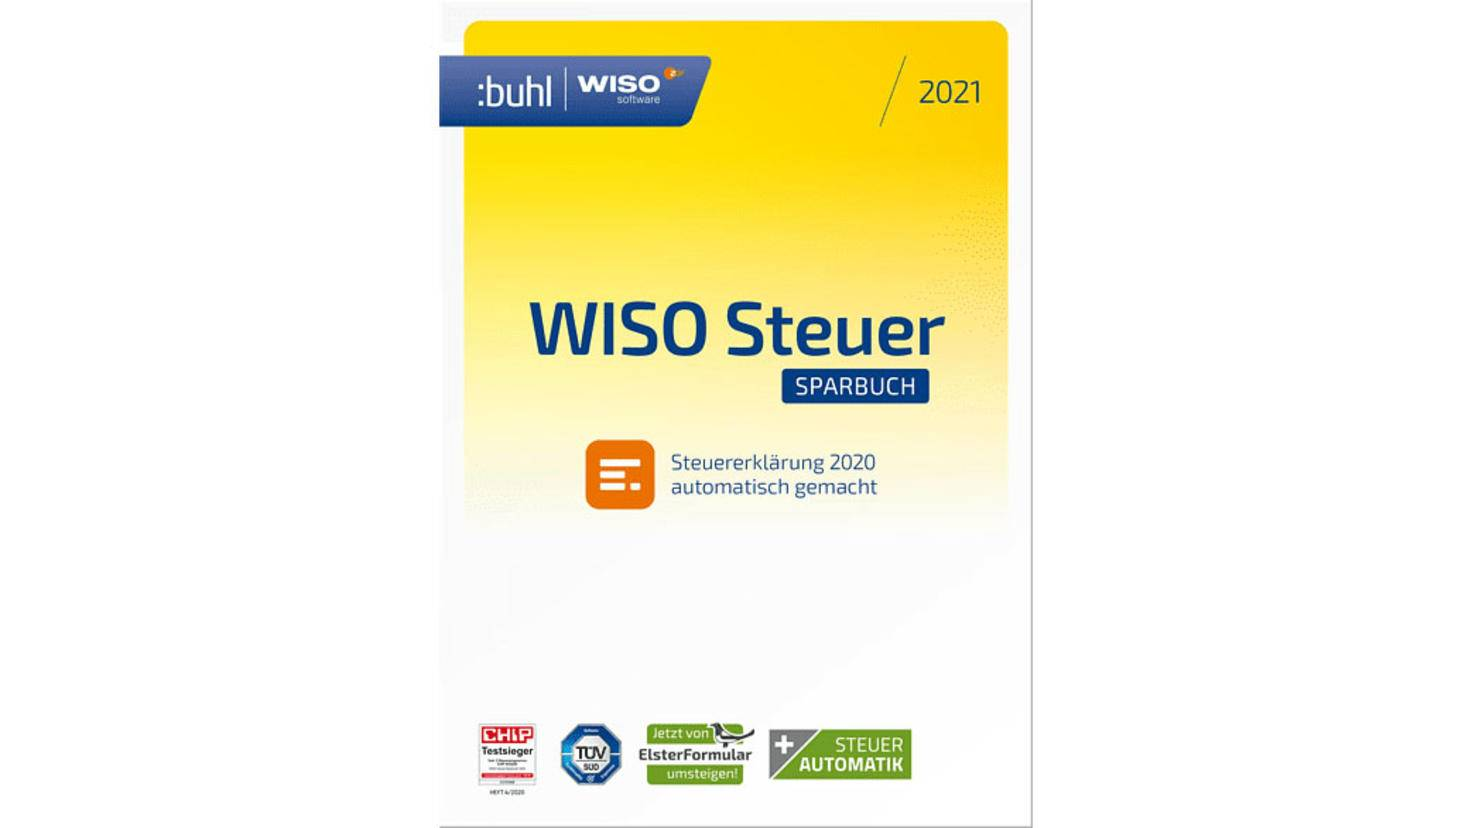 wiso-steuer-sparbuch